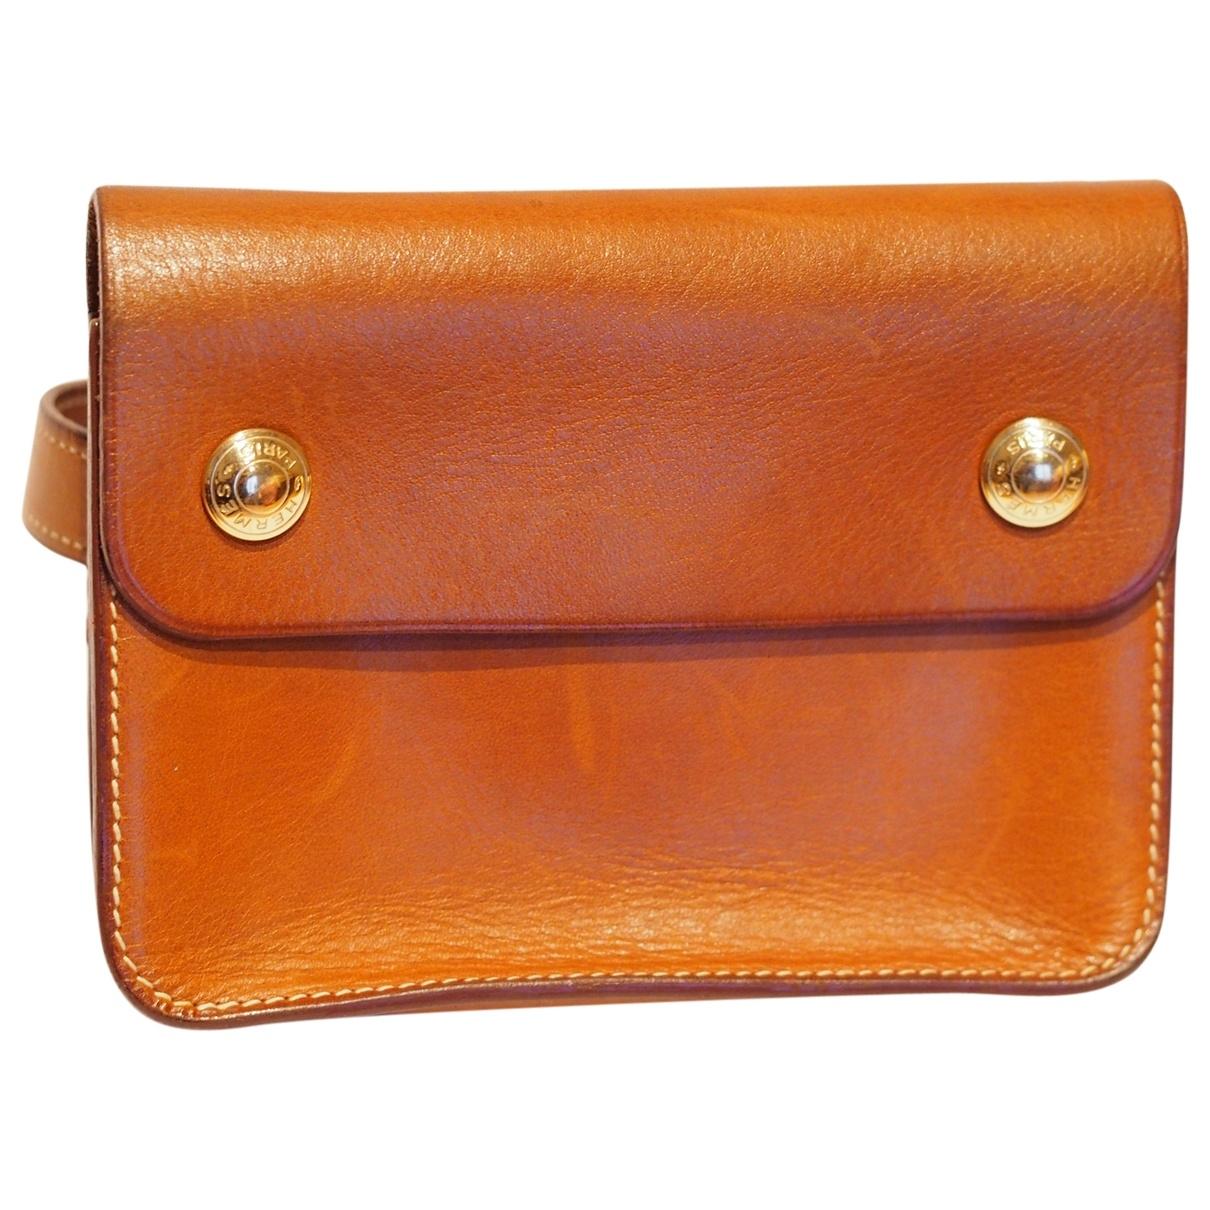 Hermès \N Camel Leather Clutch bag for Women \N